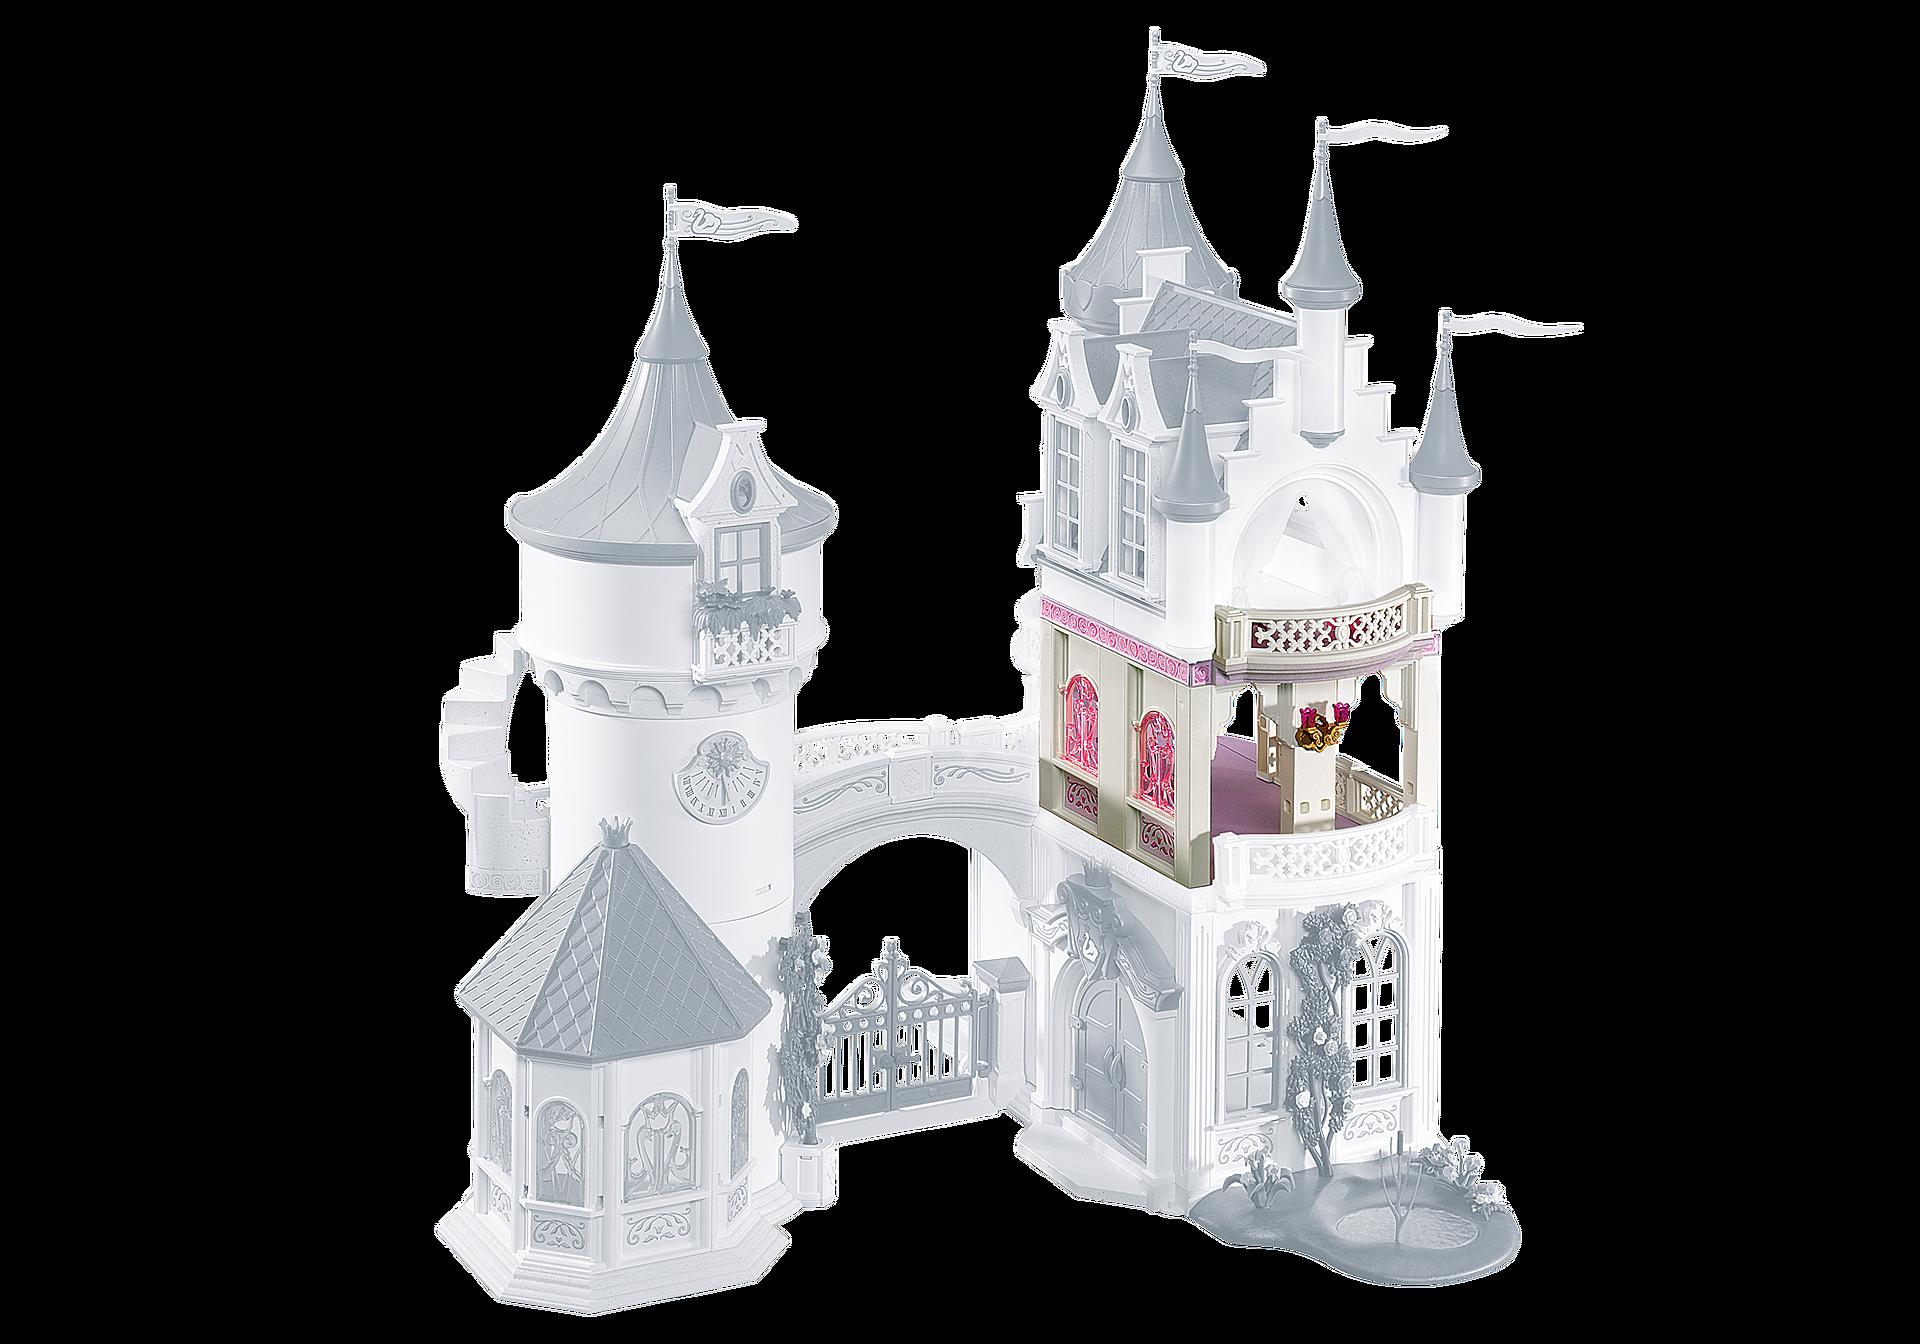 http://media.playmobil.com/i/playmobil/6236_product_detail/Extensión para el Palacio de Princesas 5142